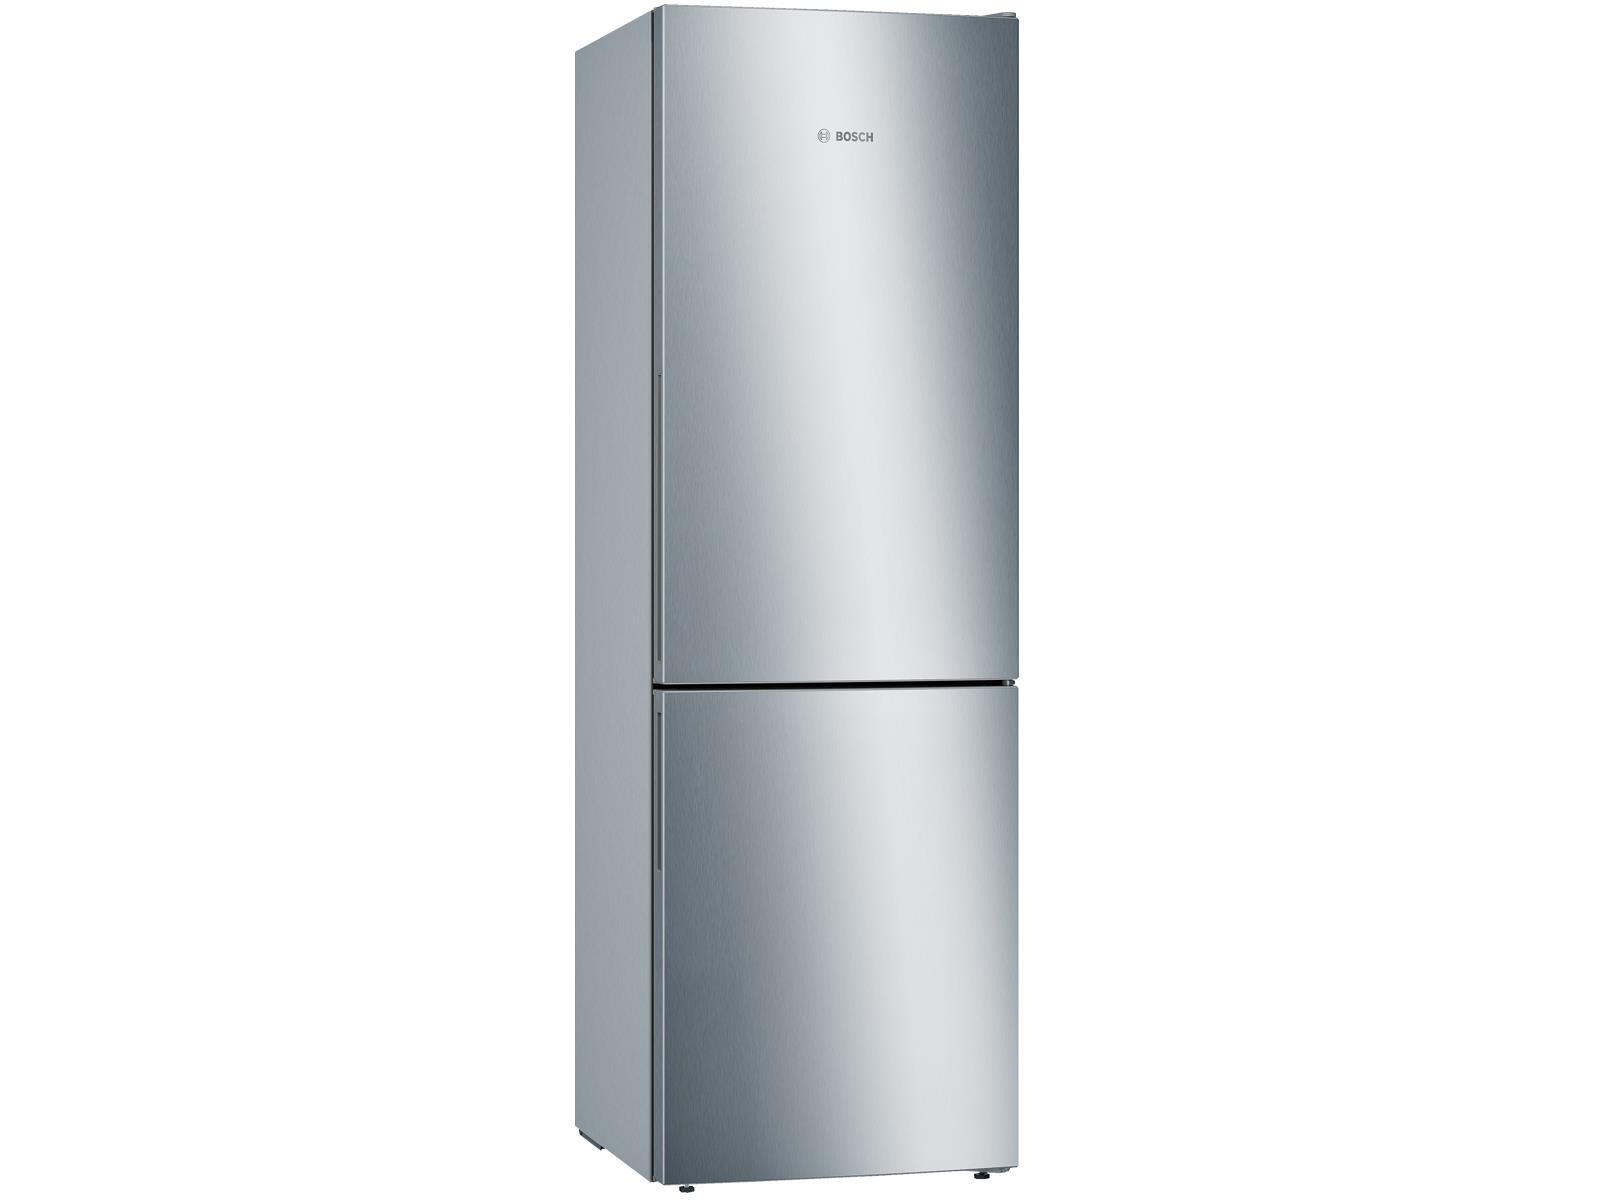 Bosch KGE36ALCA Fritstående Køle-/Fryseskab – LowFrost – 186 cm